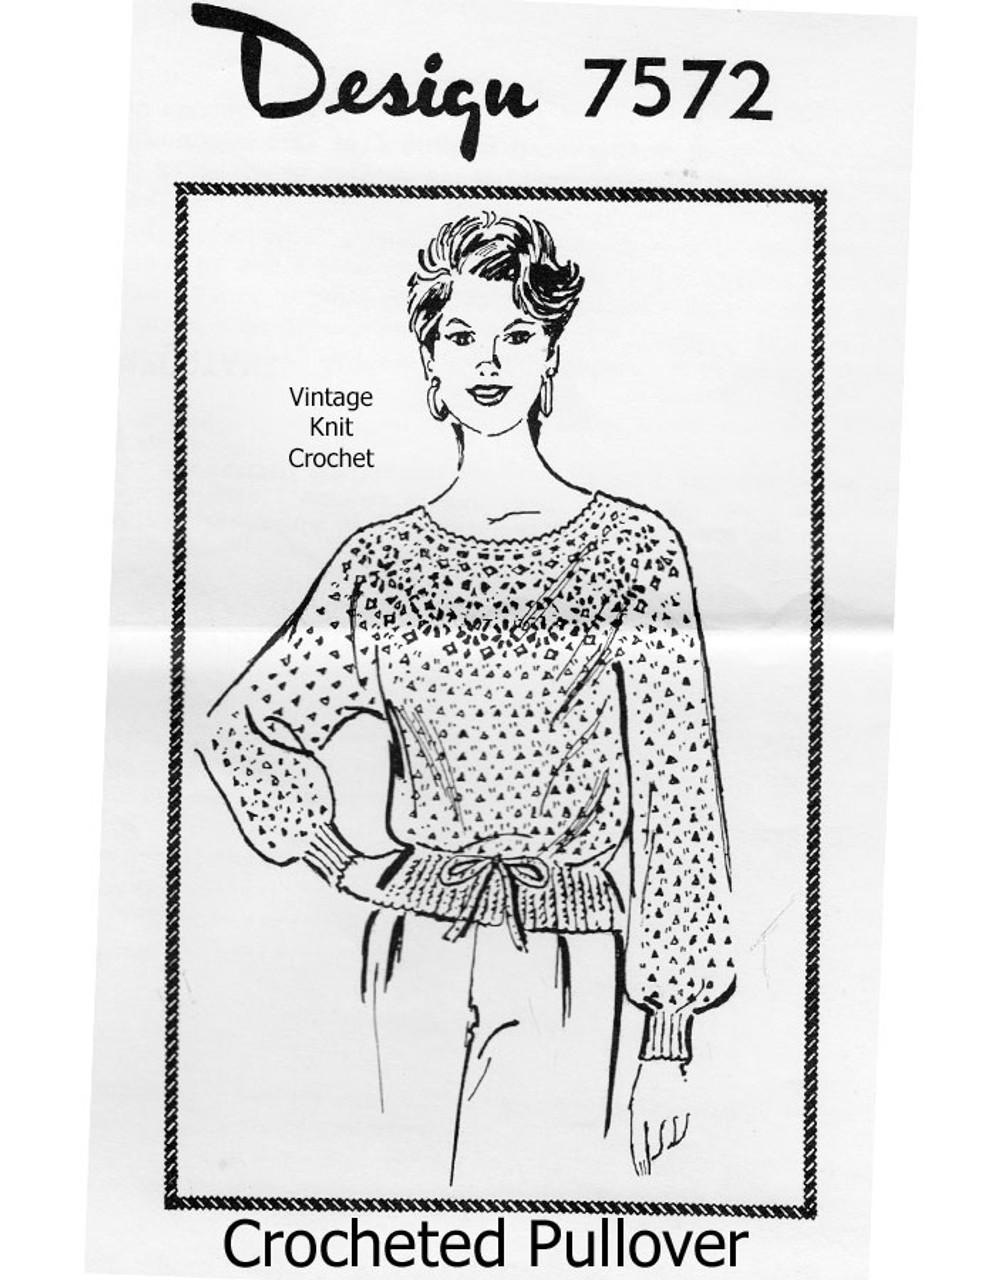 Crochet Drawstring Blouse Pattern Design 7572